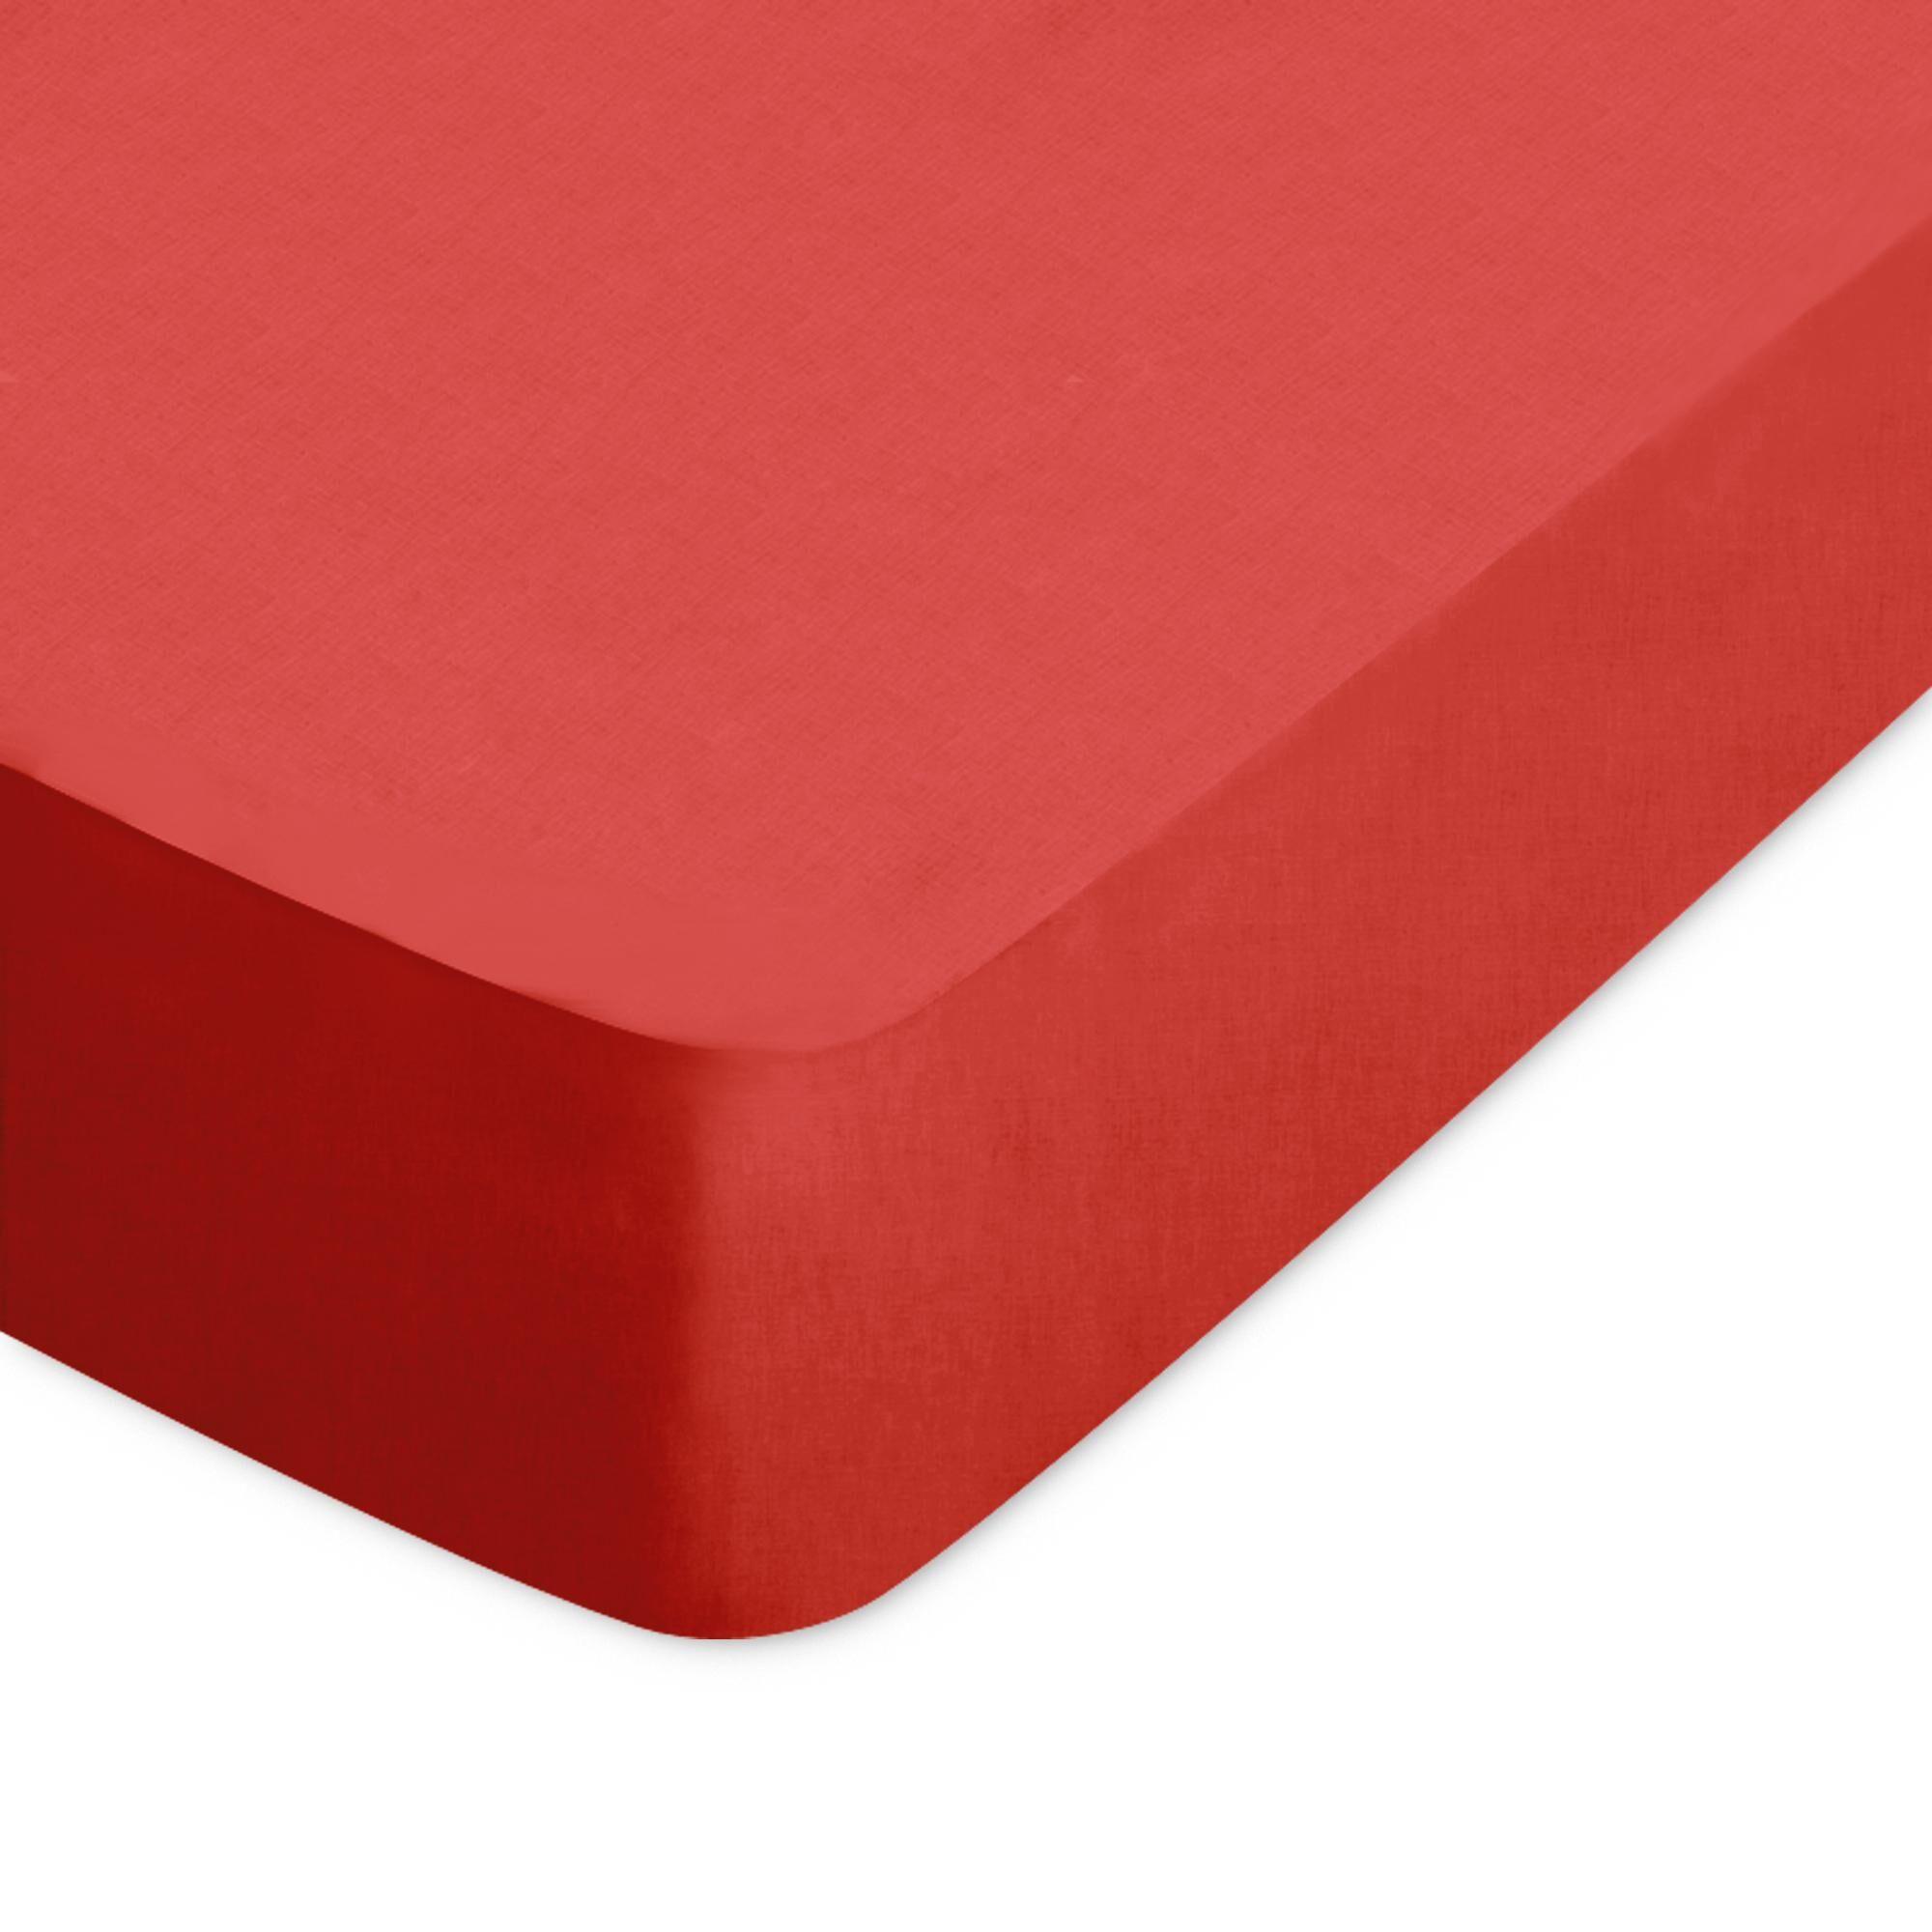 Linnea Drap housse uni 160x220 cm 100% coton ALTO orange Baie de Goji